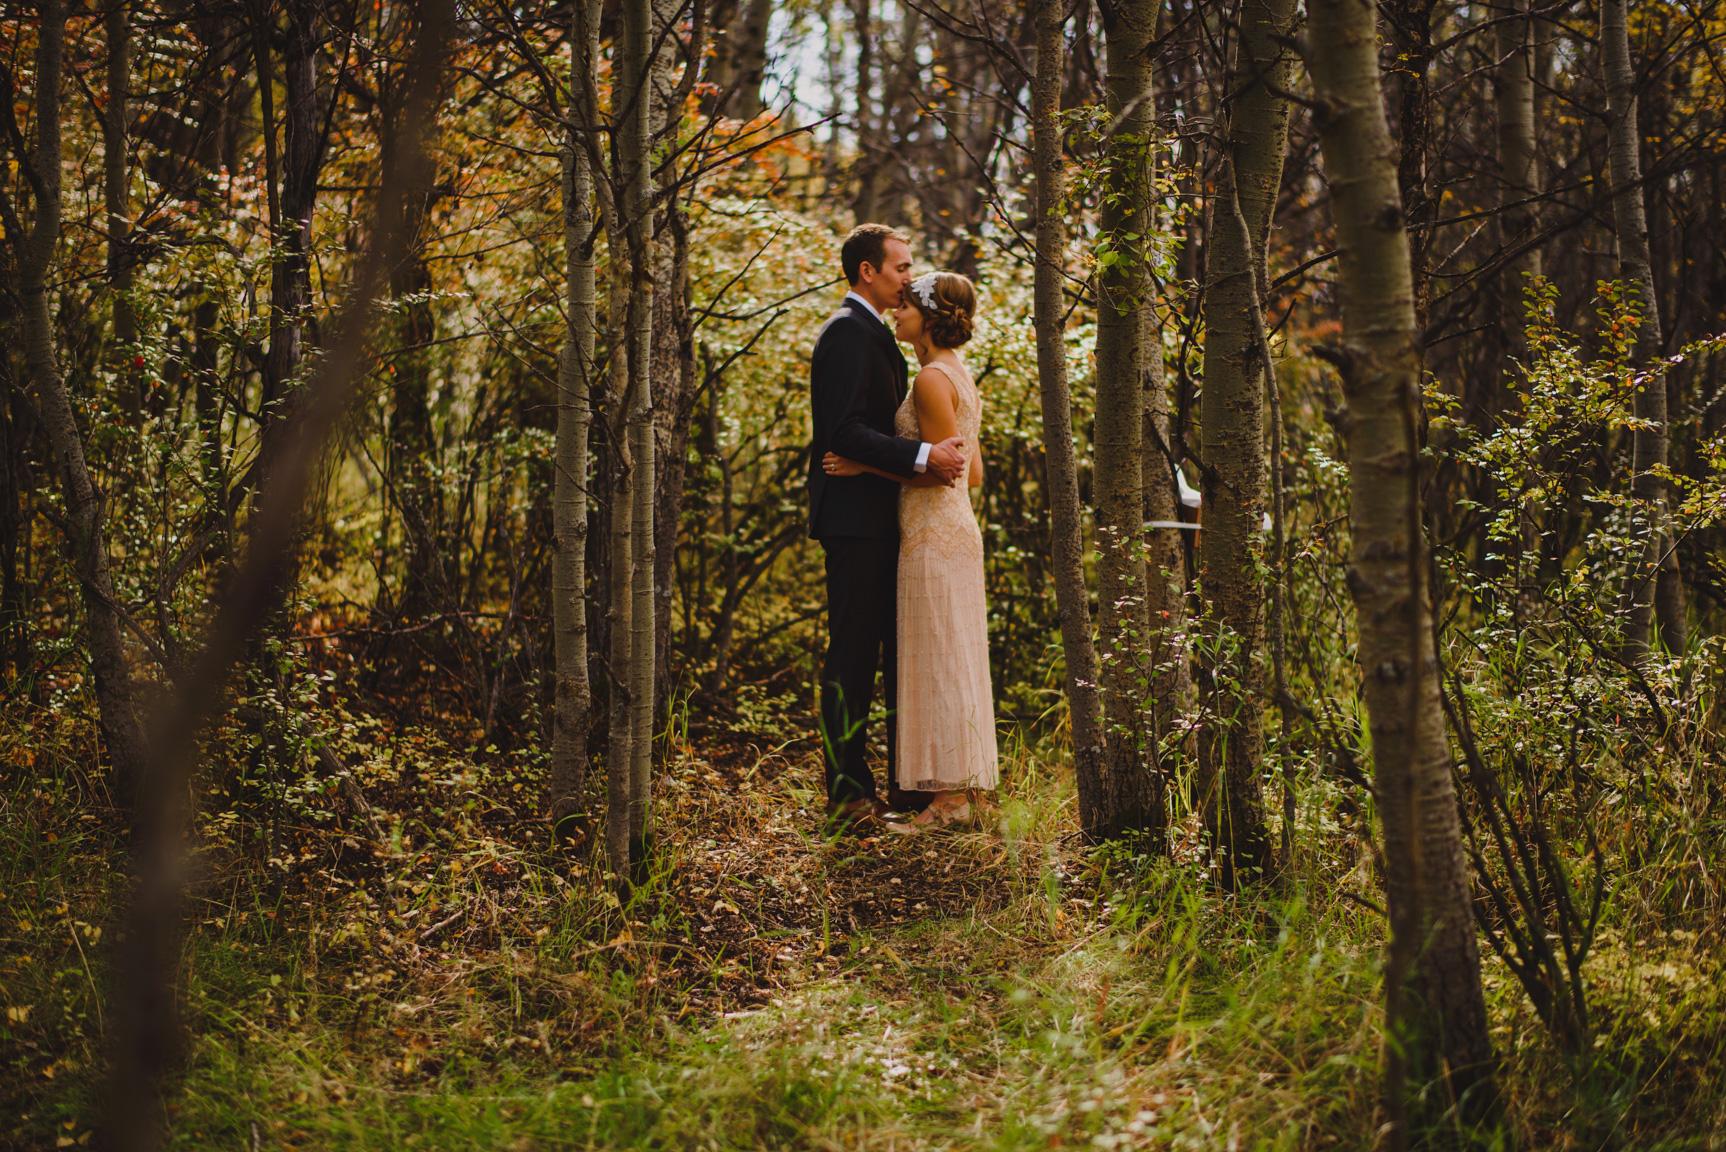 Calgary-Wedding-Photographer-27.jpg